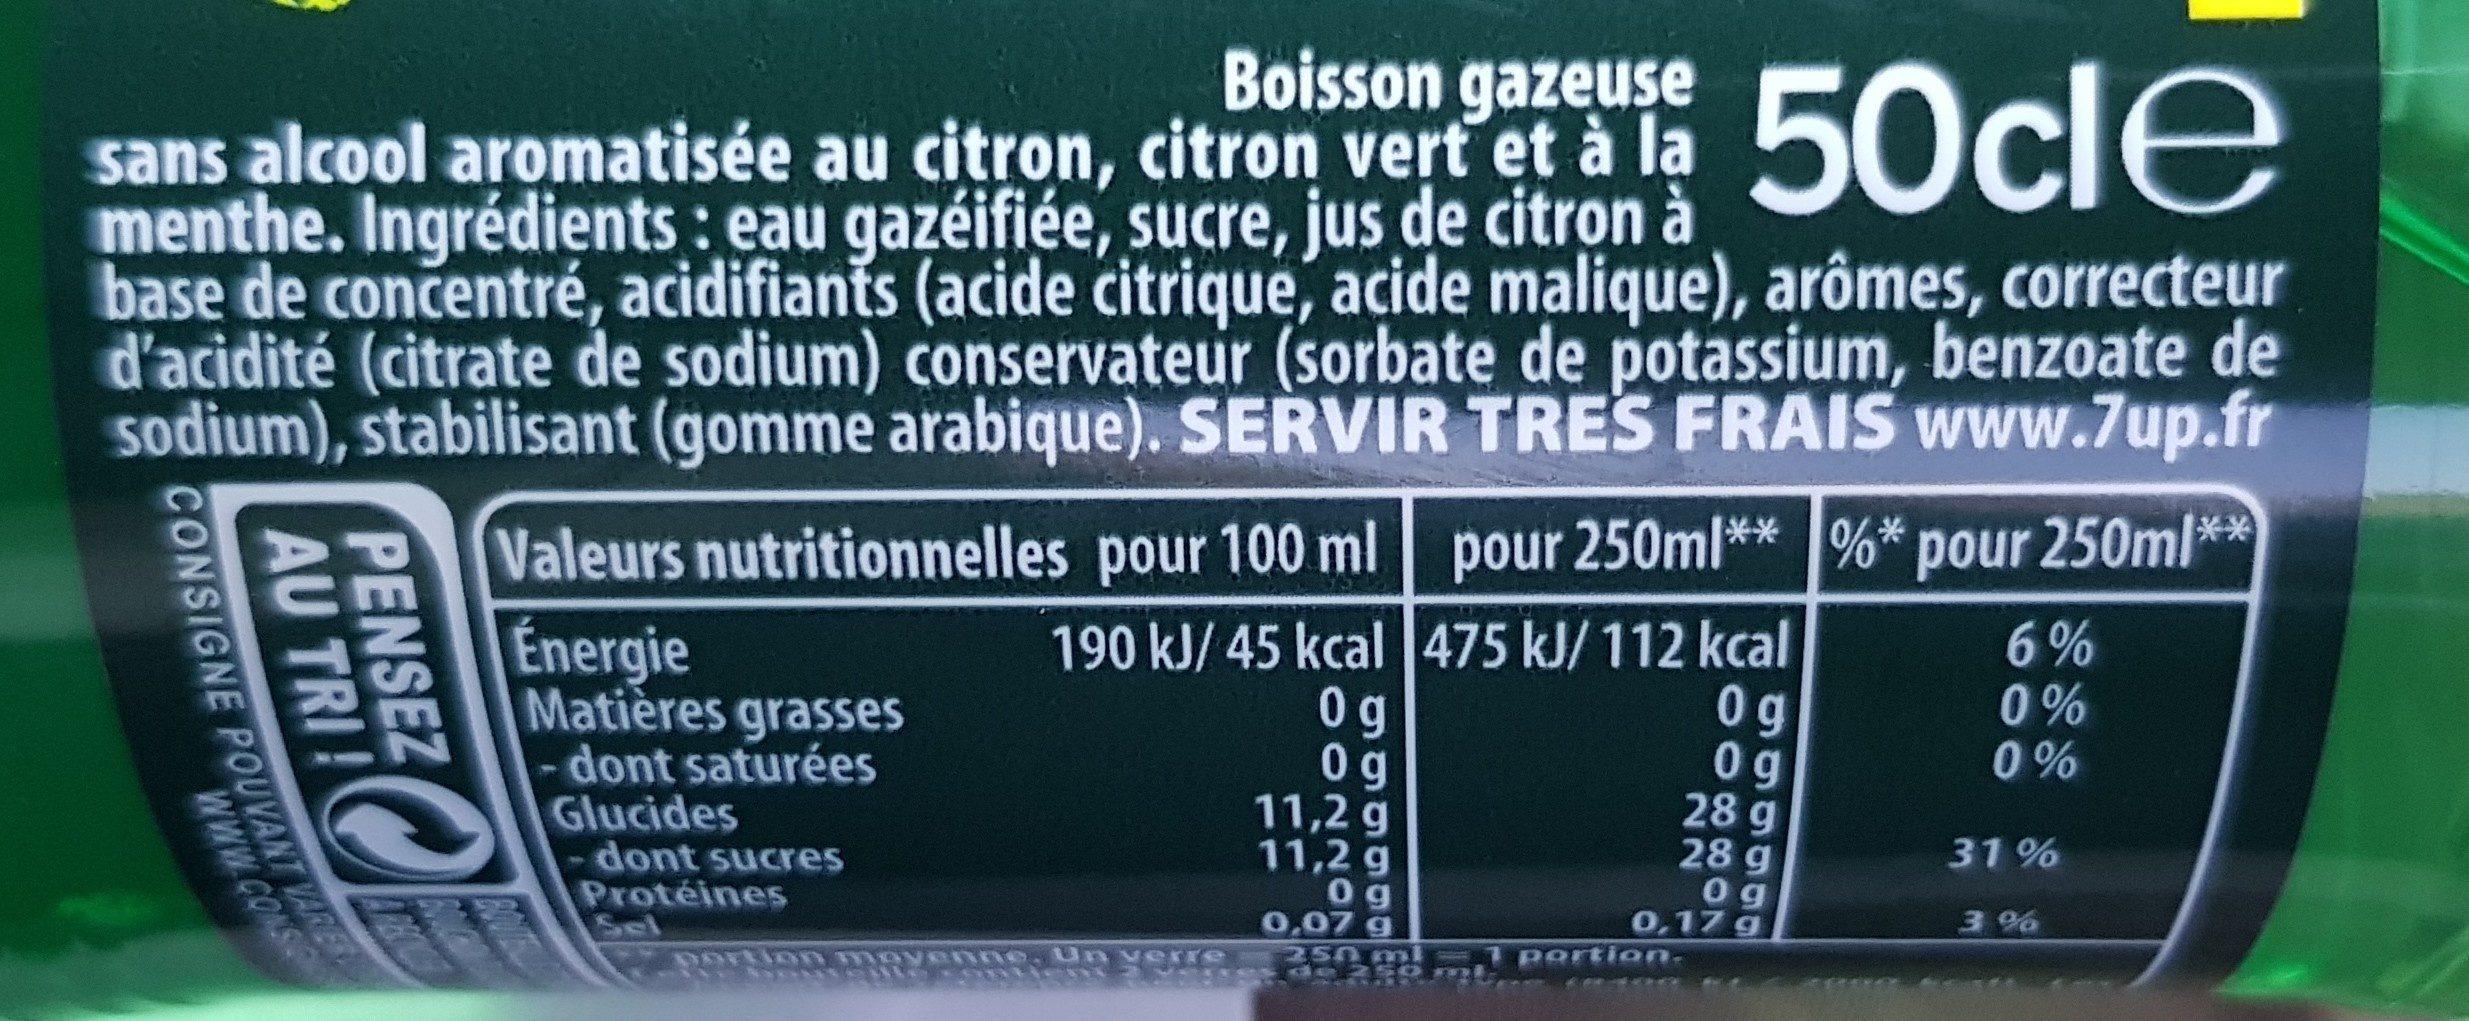 7UP saveur mojito 50 cl - Ingrédients - fr